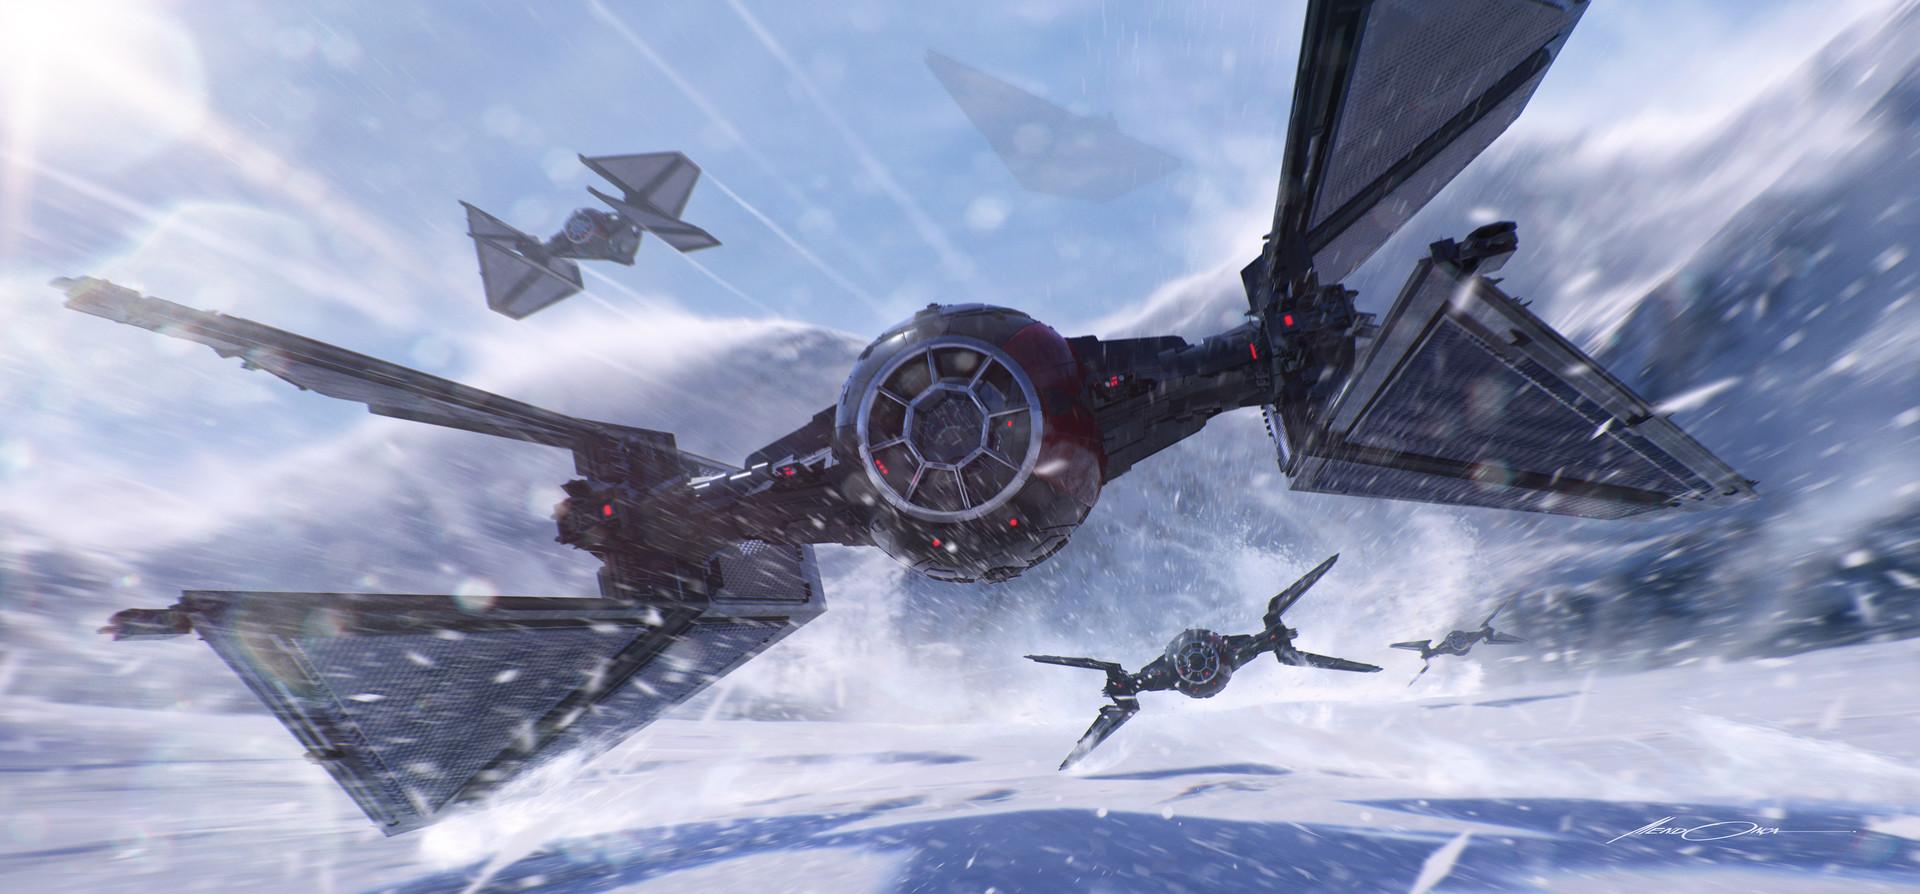 Star Wars Stormtroopers Fantasy Art Artwork Bwing Down: STAR WARS, GUS MENDONCA